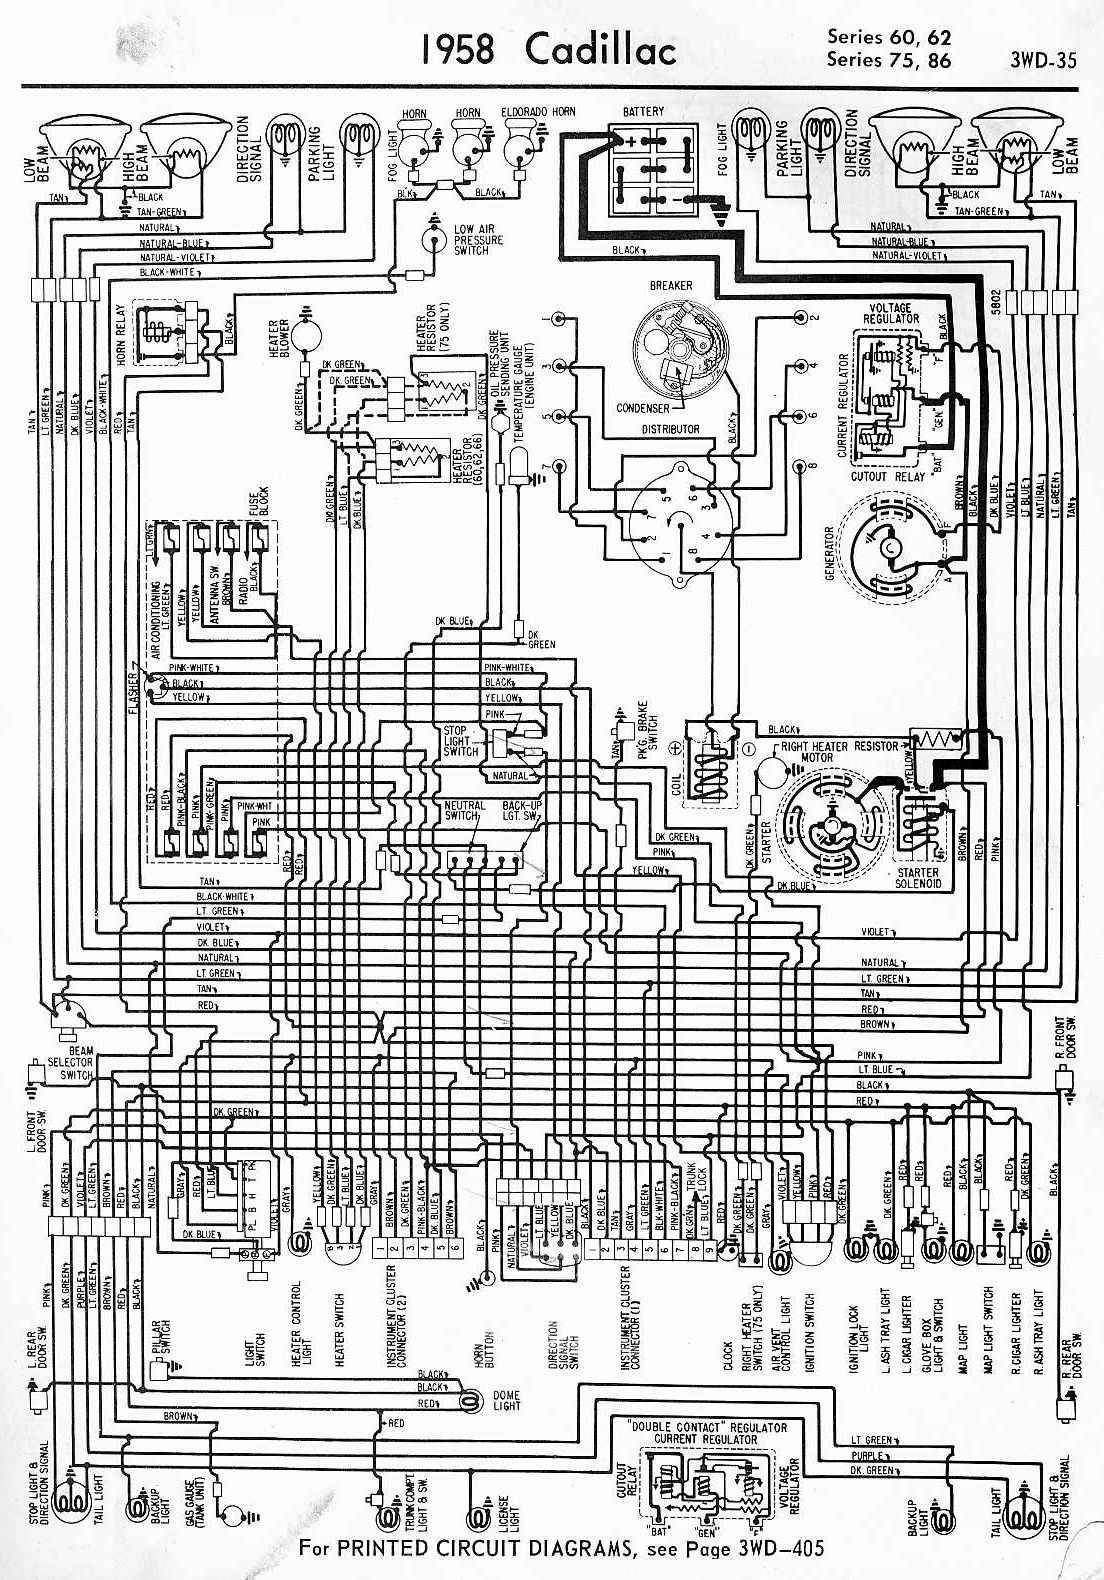 medium resolution of 1948 cadillac wiring diagram wiring diagrams schema mustang fuse box 1948 cadillac fuse box